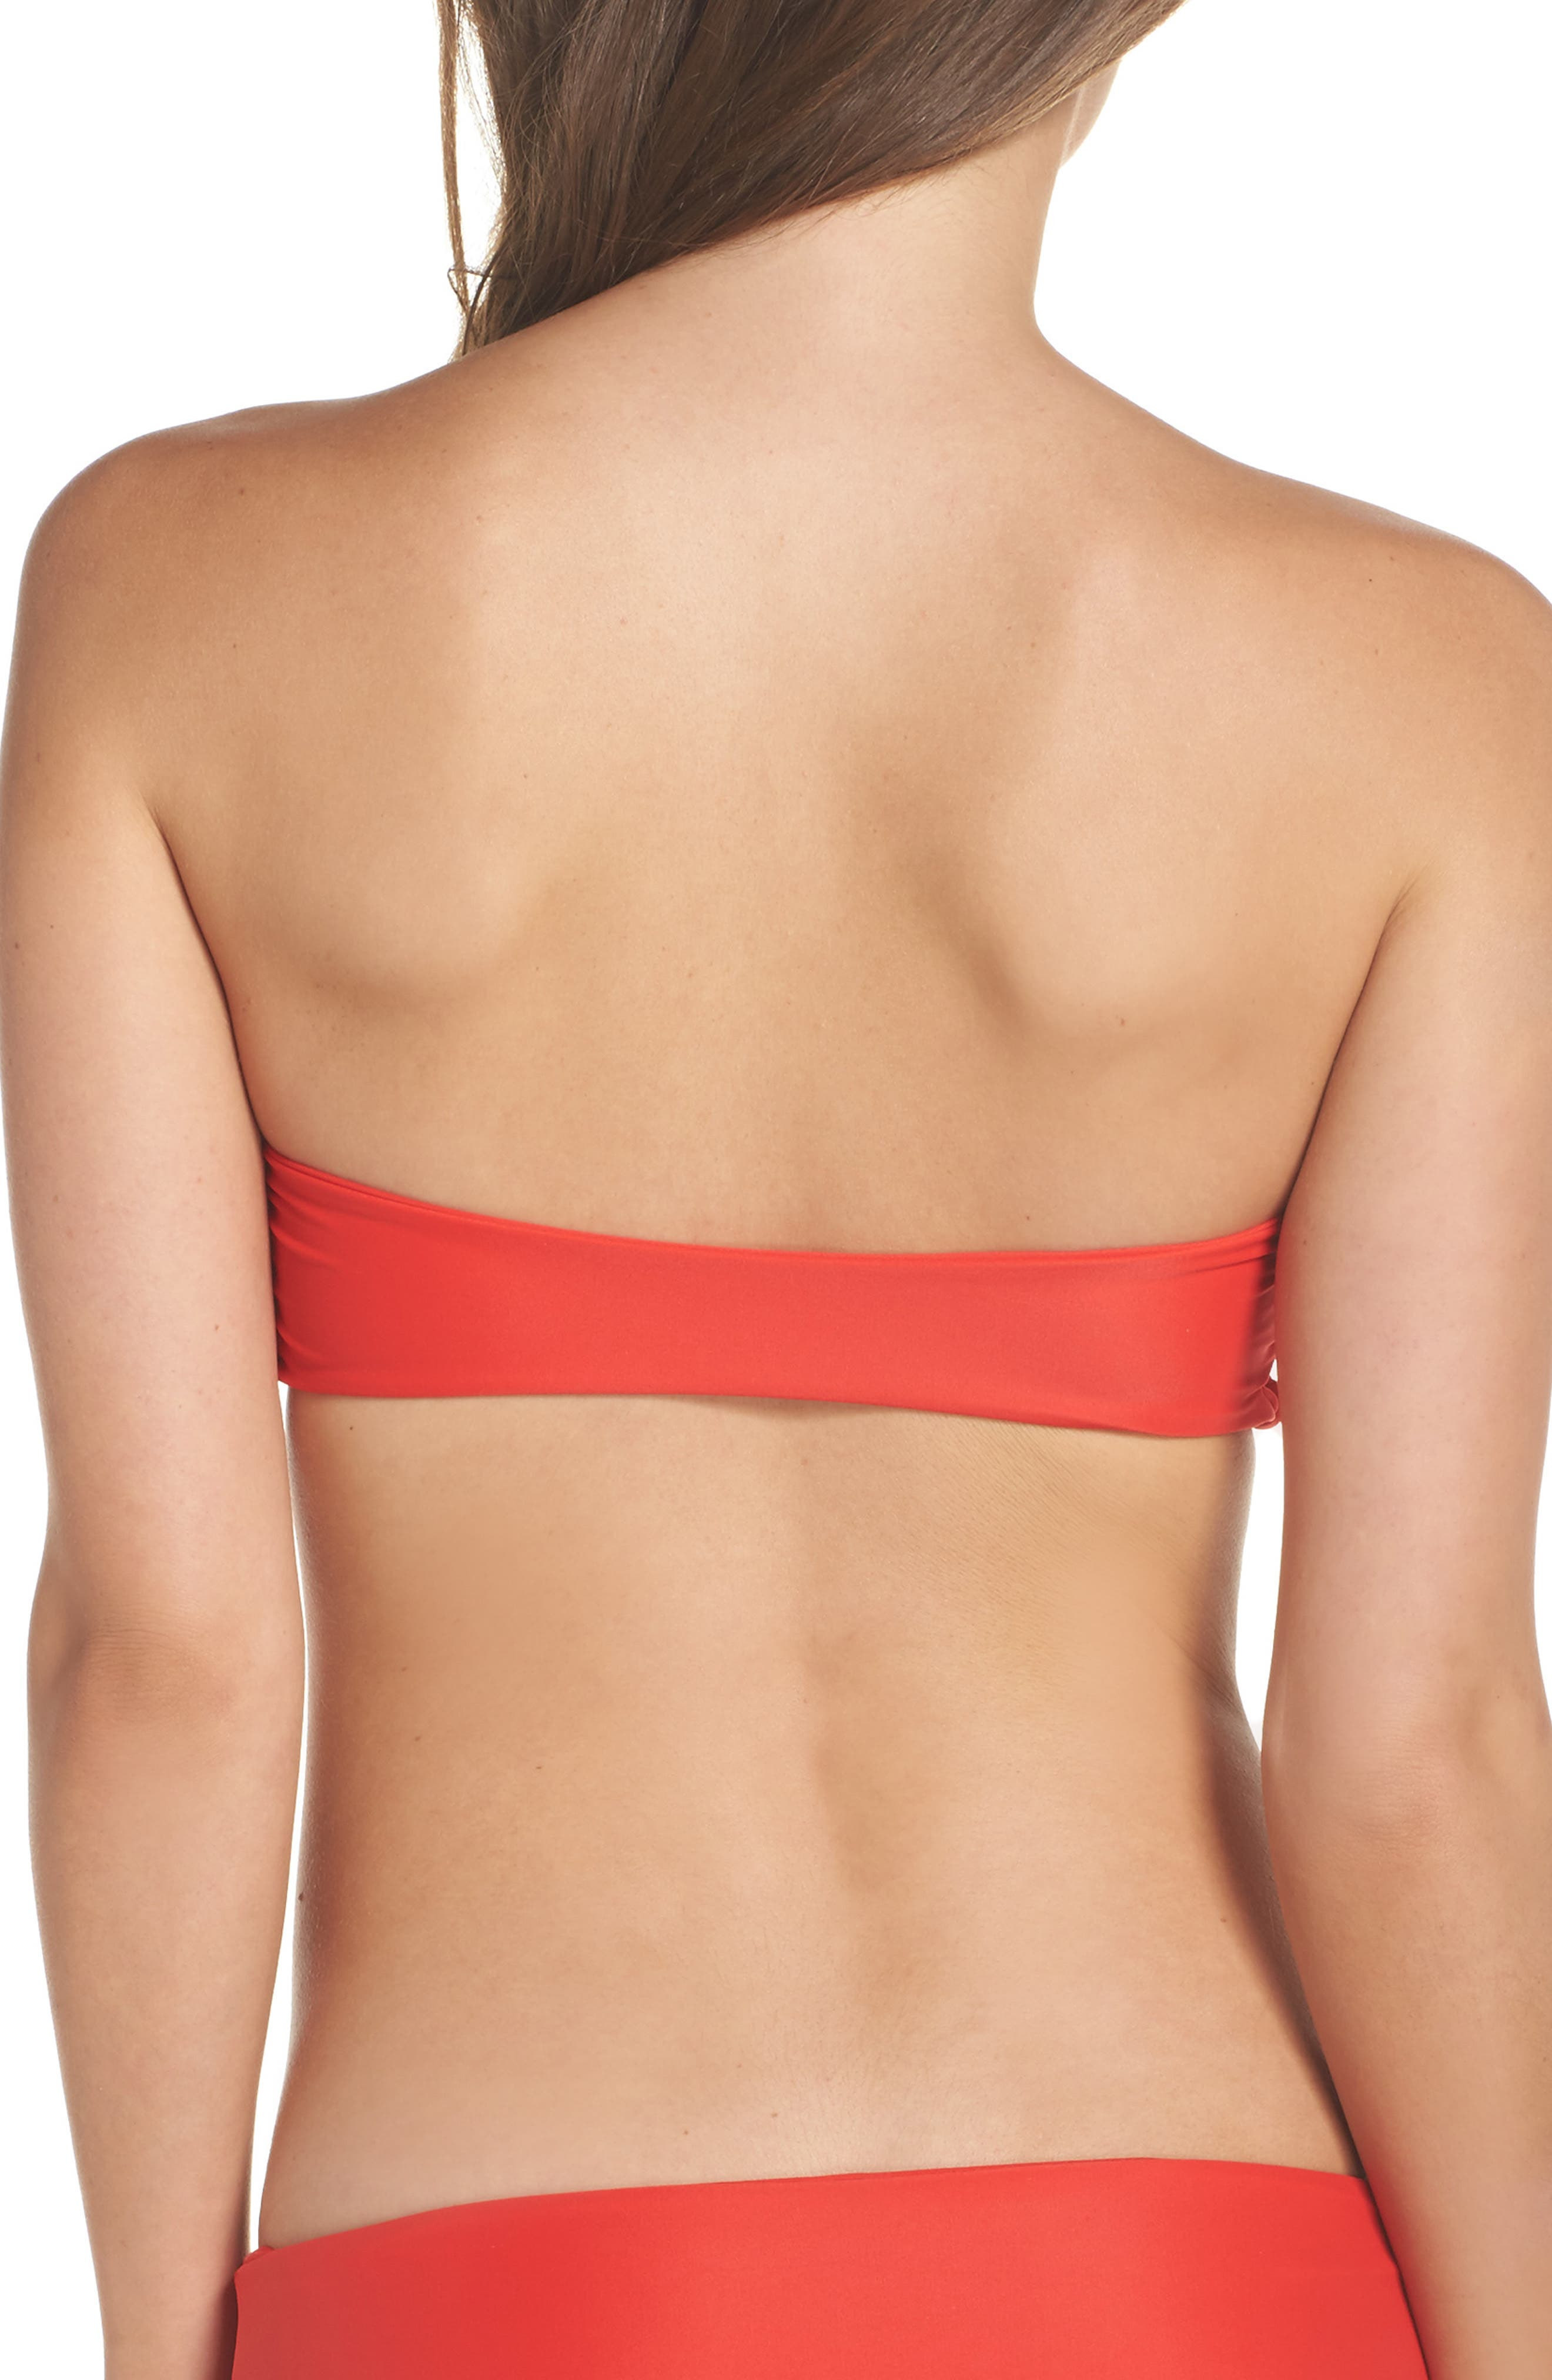 Alternate Image 2  - Mikoh Monoco Bandeau Bikini Top